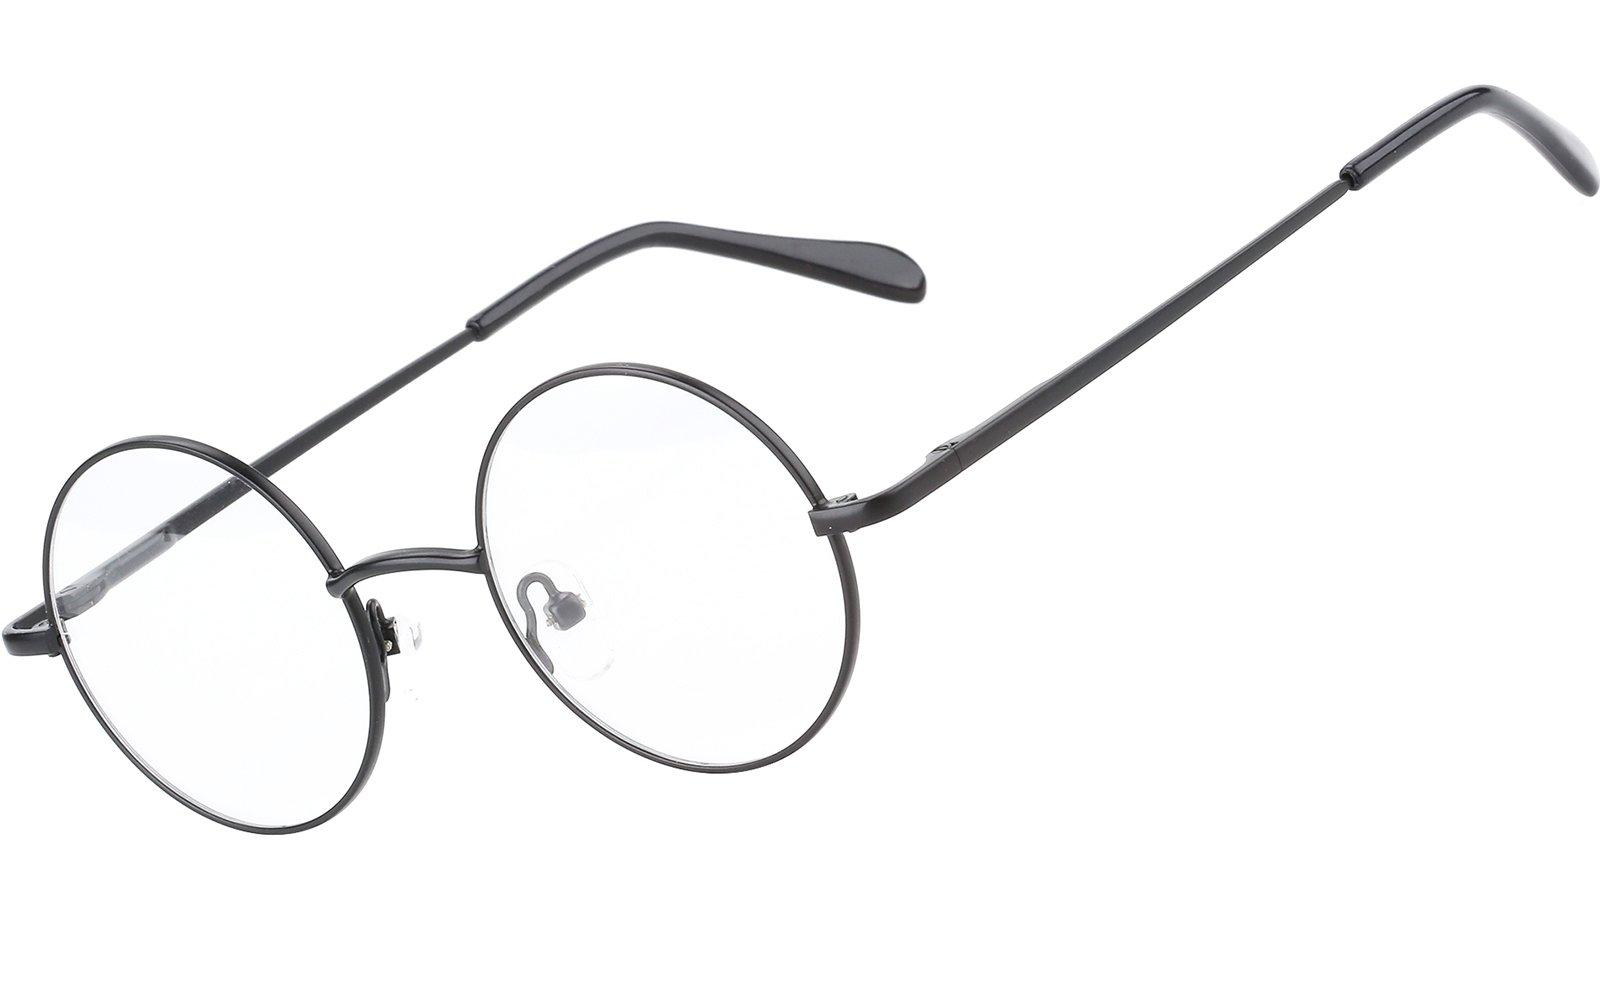 Agstum Retro Round Prescription ready Metal Eyeglass Frame (Small Size) (Black)